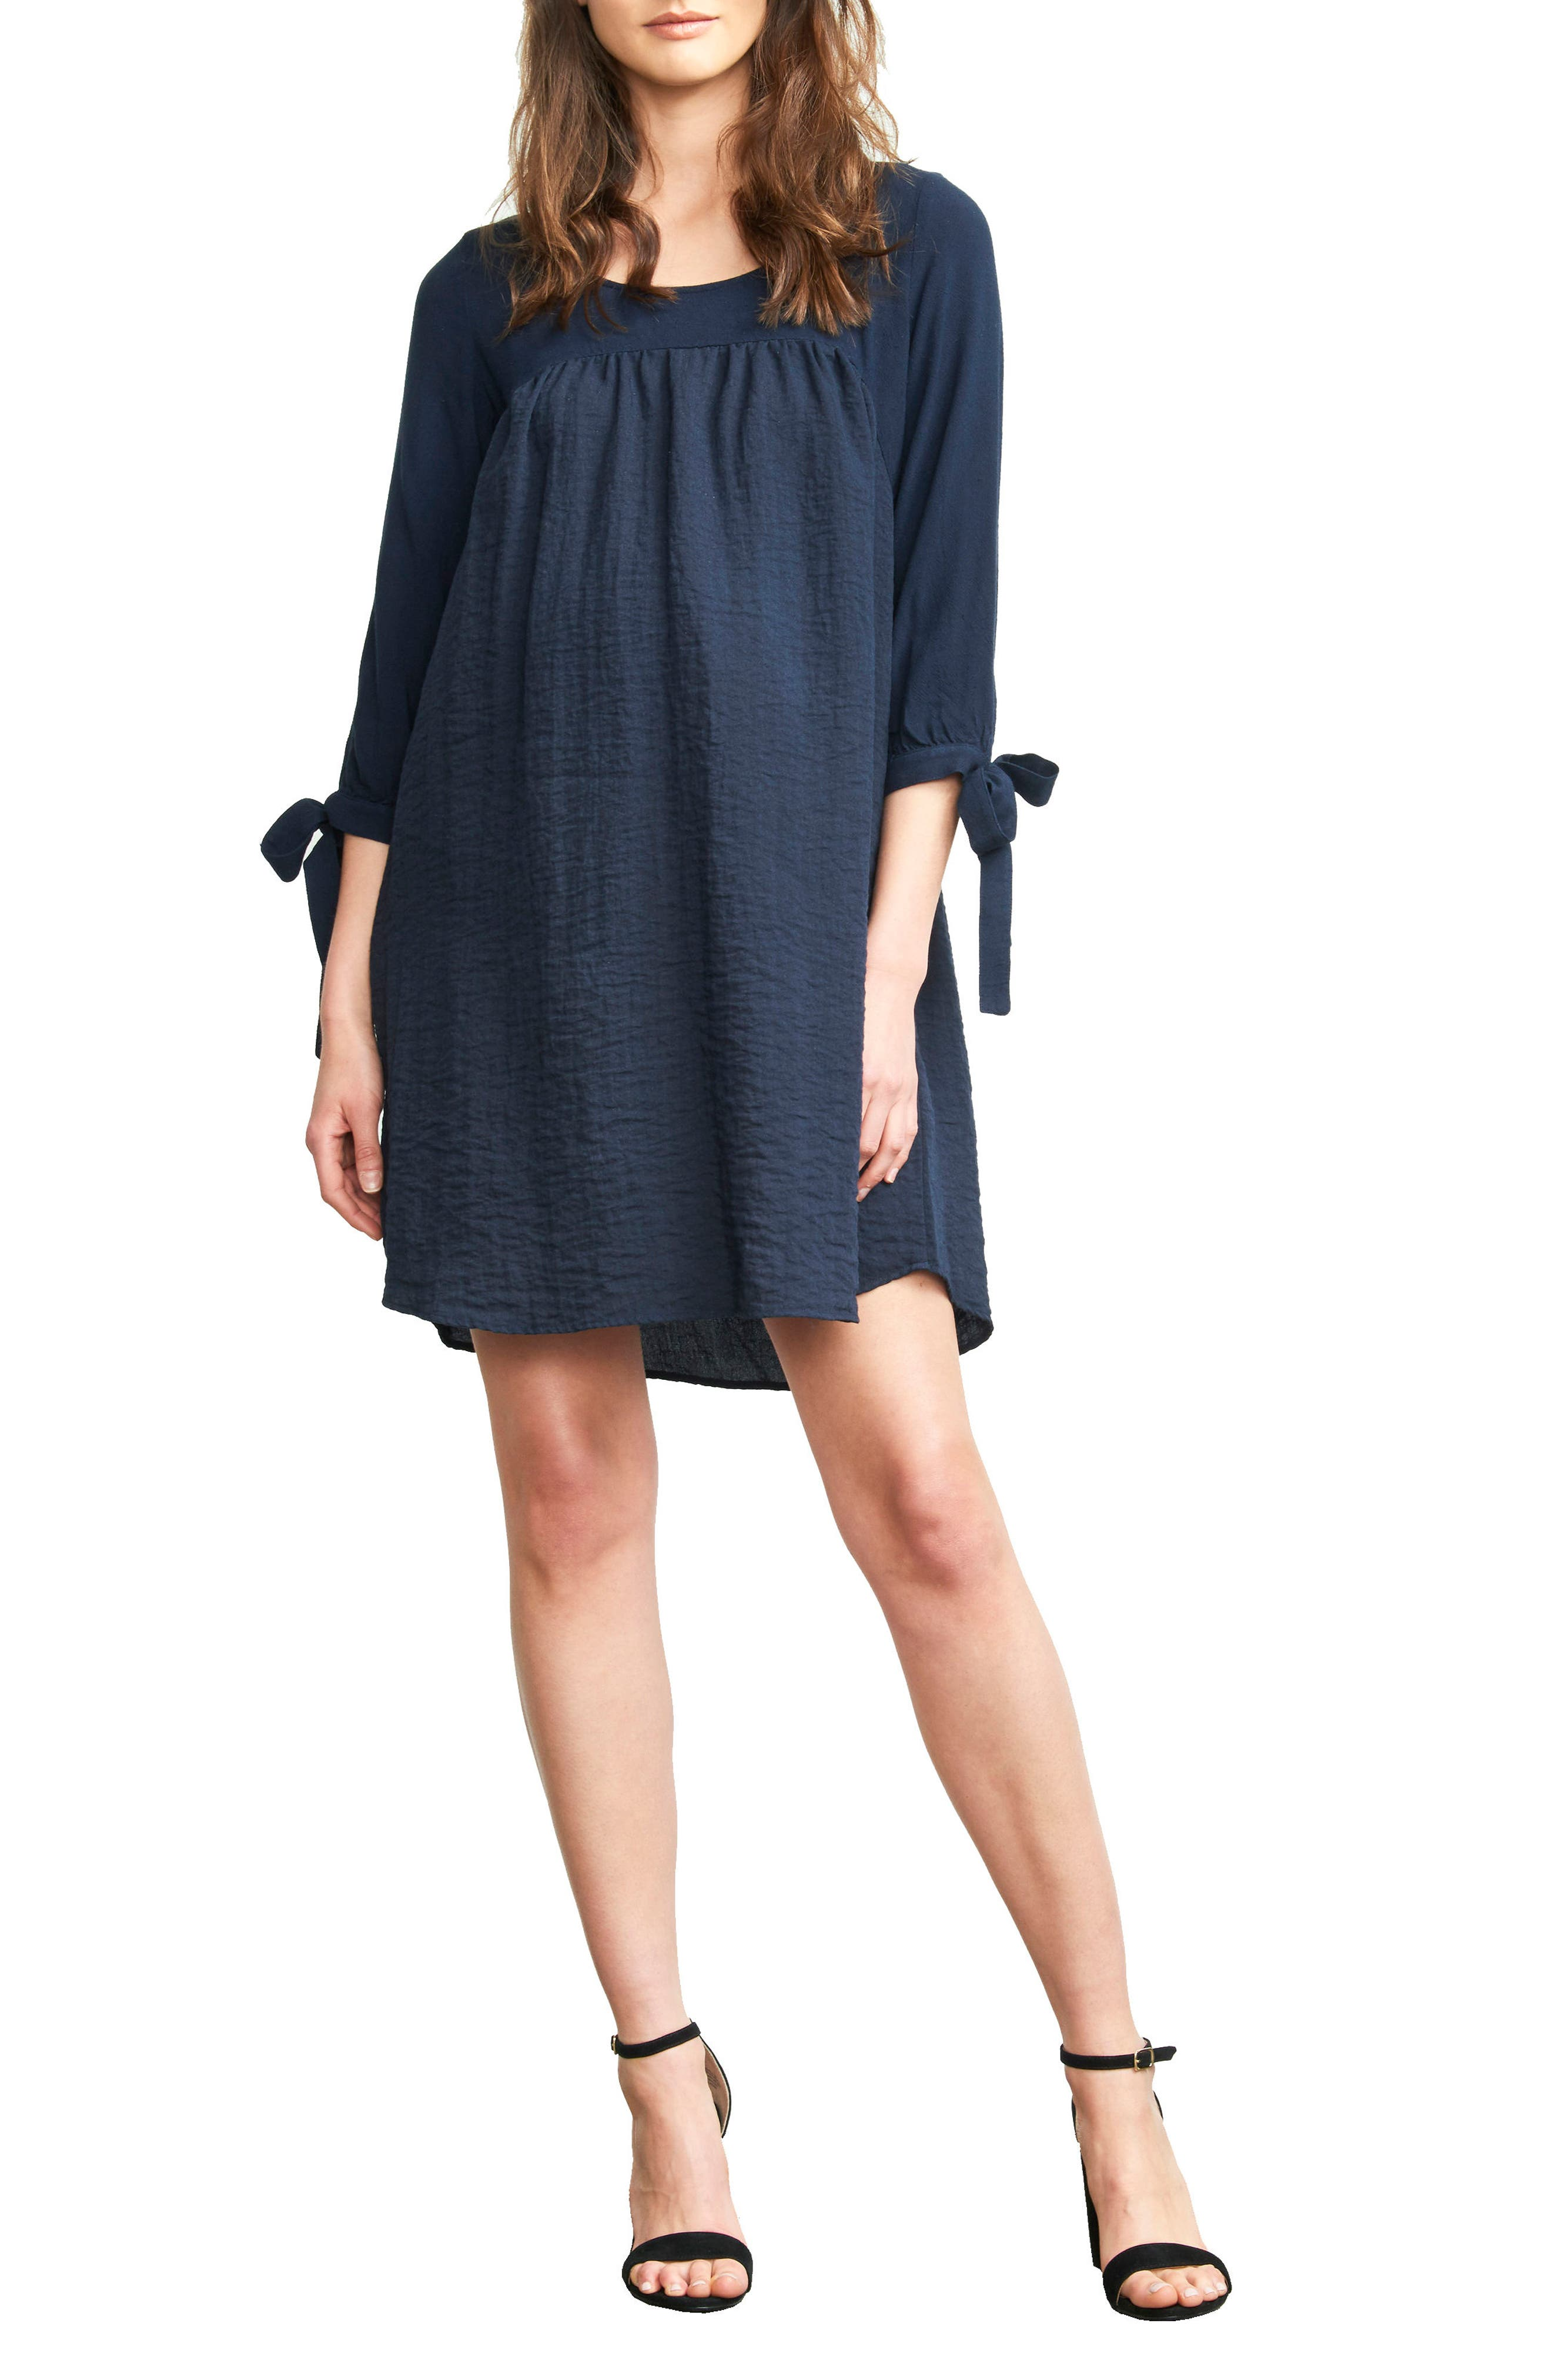 Alternate Image 1 Selected - Maternal America Babydoll Maternity Dress